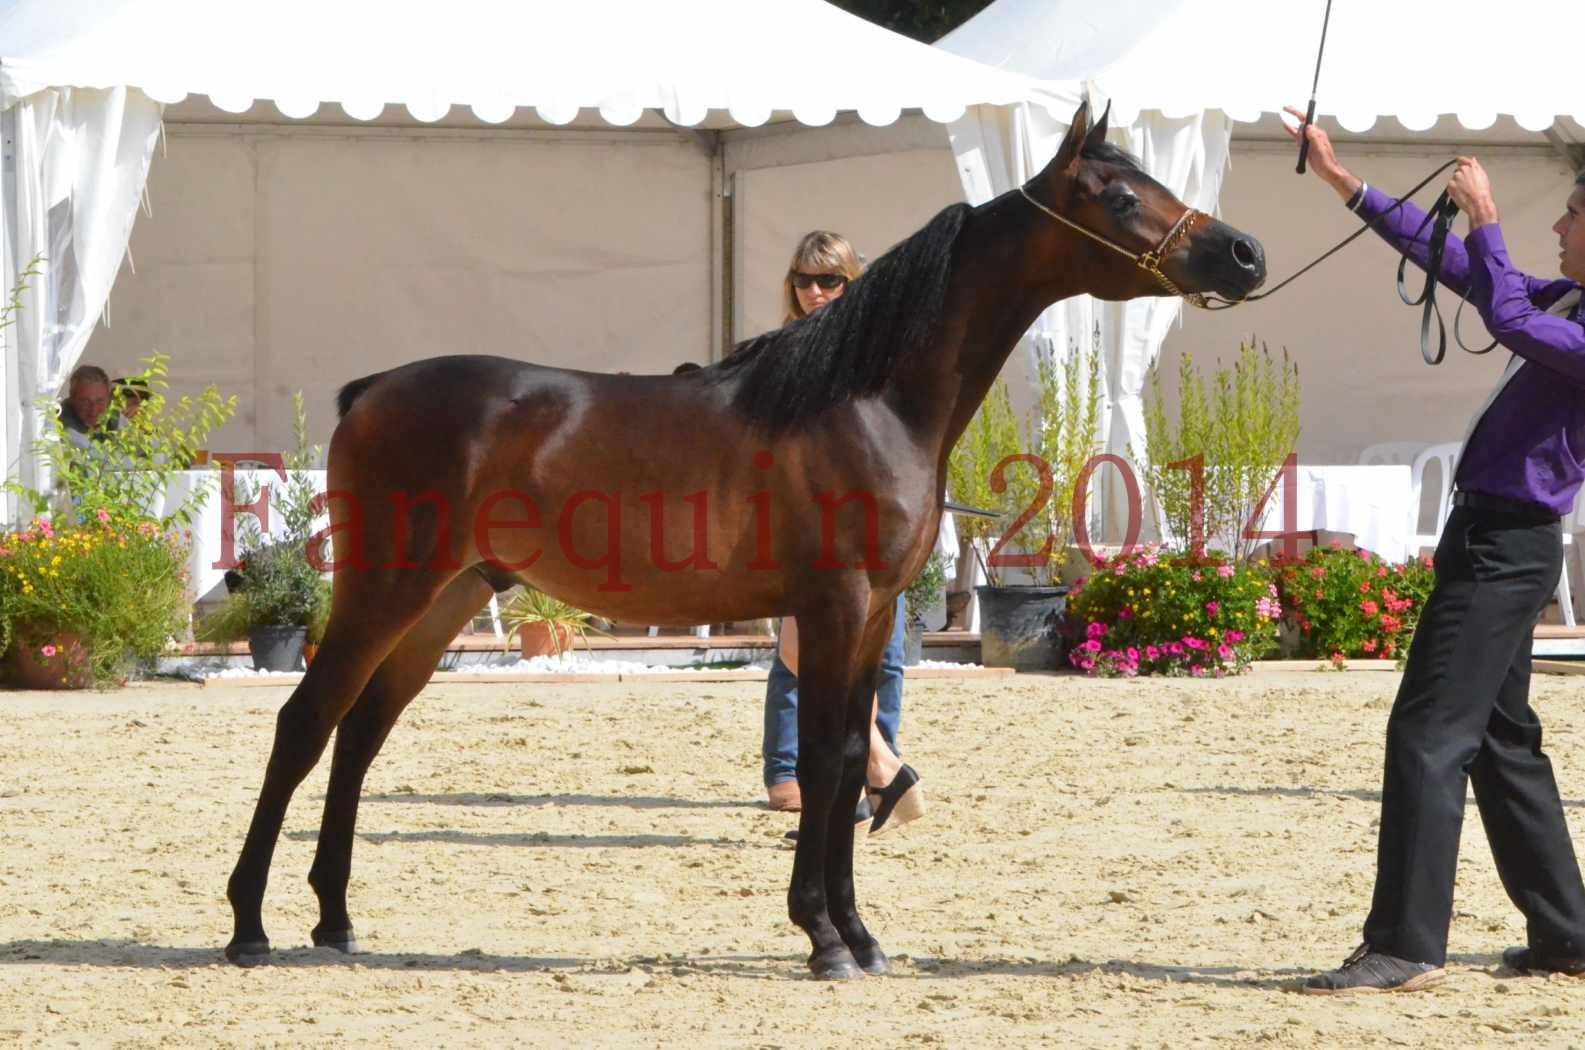 Championnat de FRANCE 2014 - Amateurs - SH FARAJAA - 37